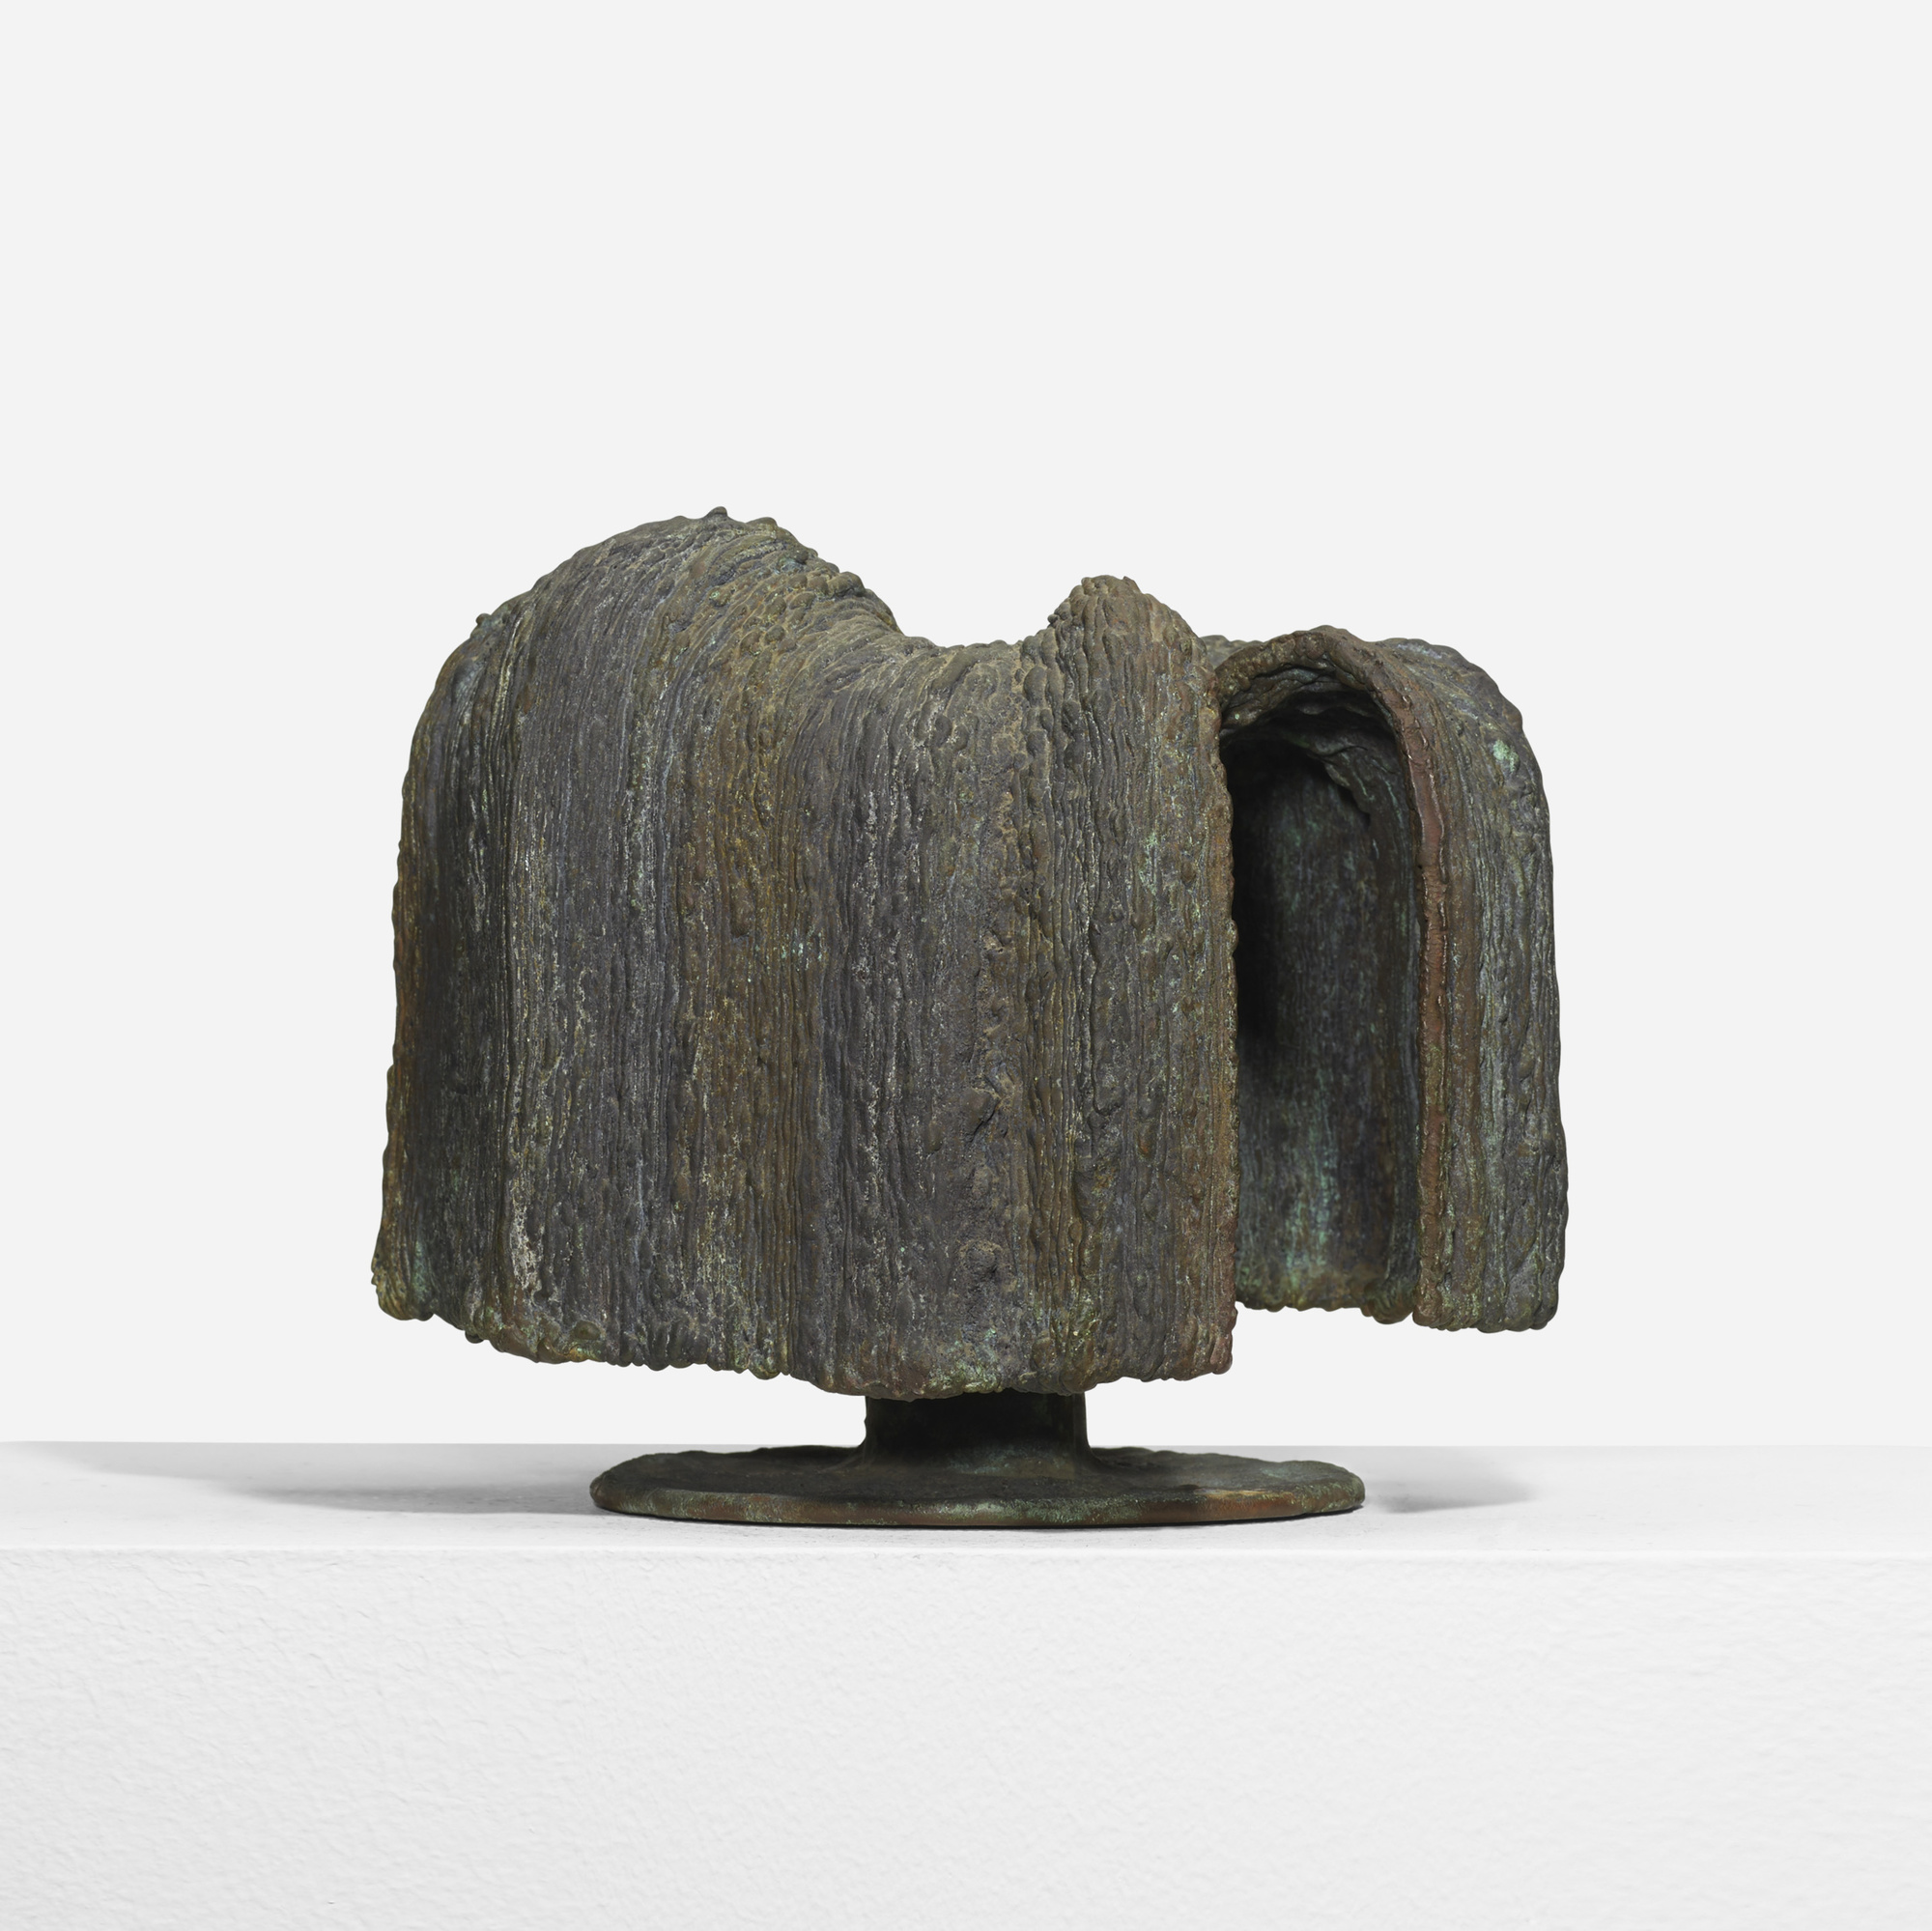 188: Harry Bertoia / Untitled (Welded Form) (1 of 4)